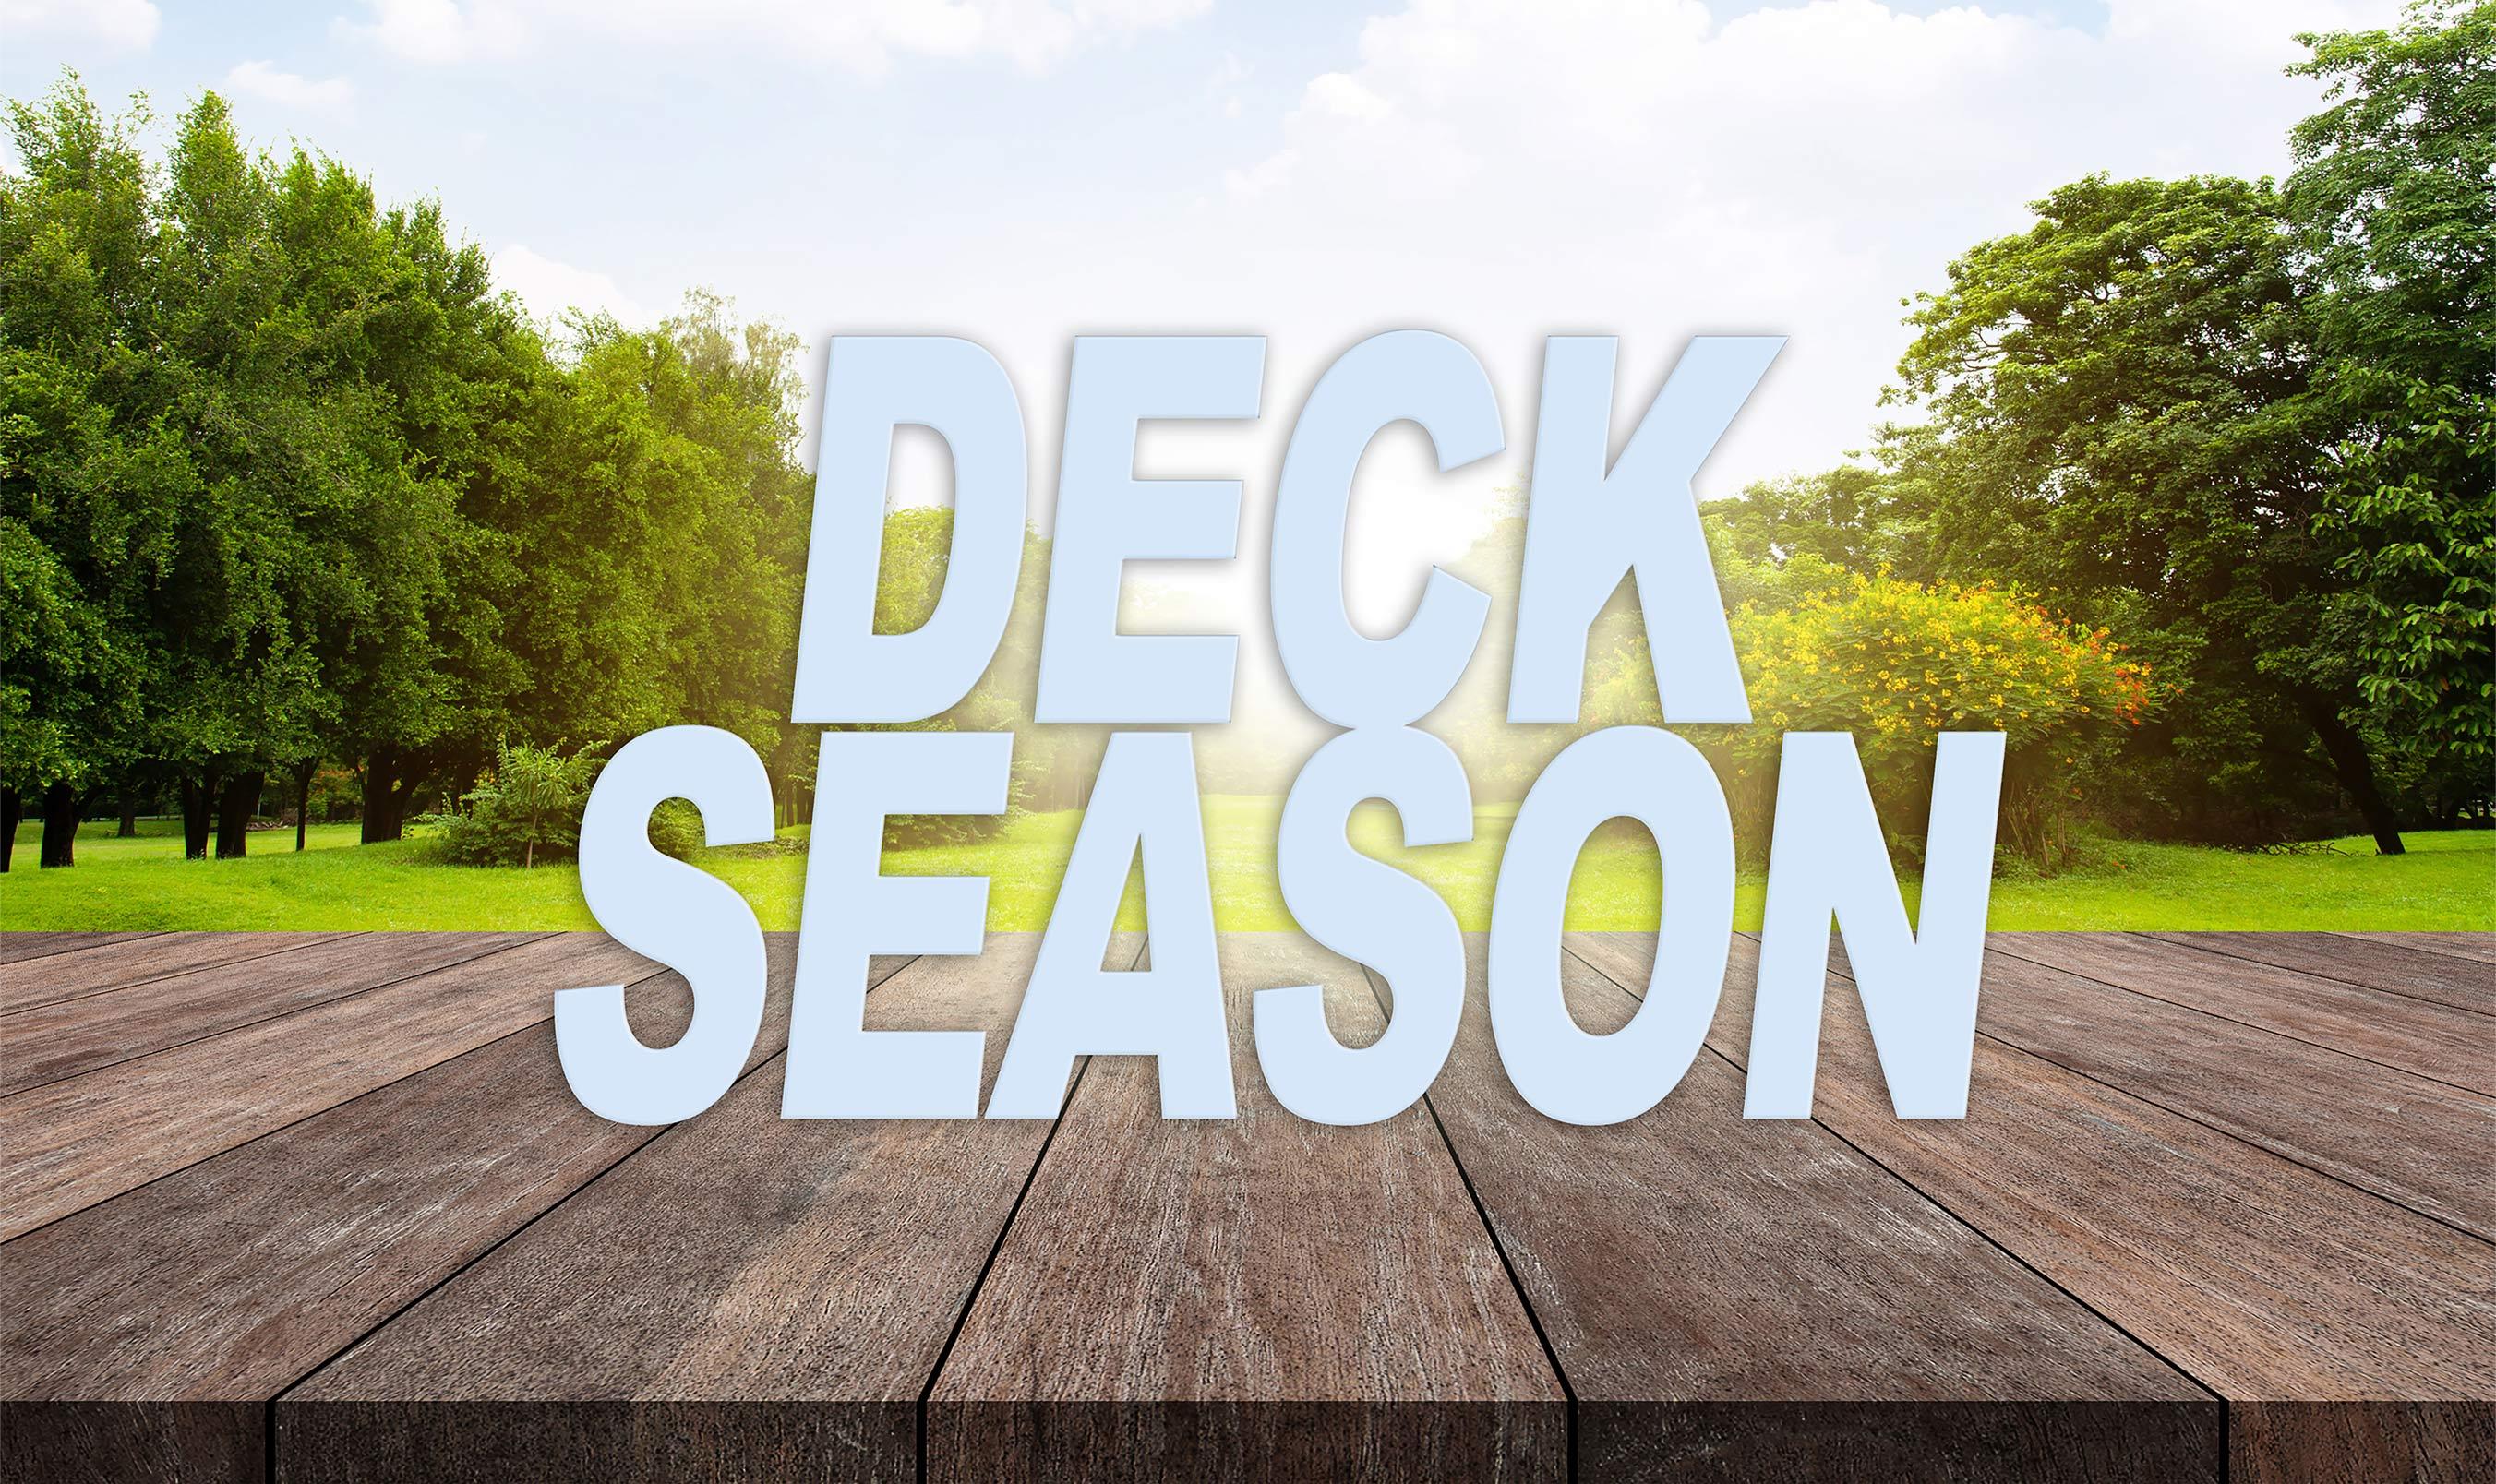 Deck Season